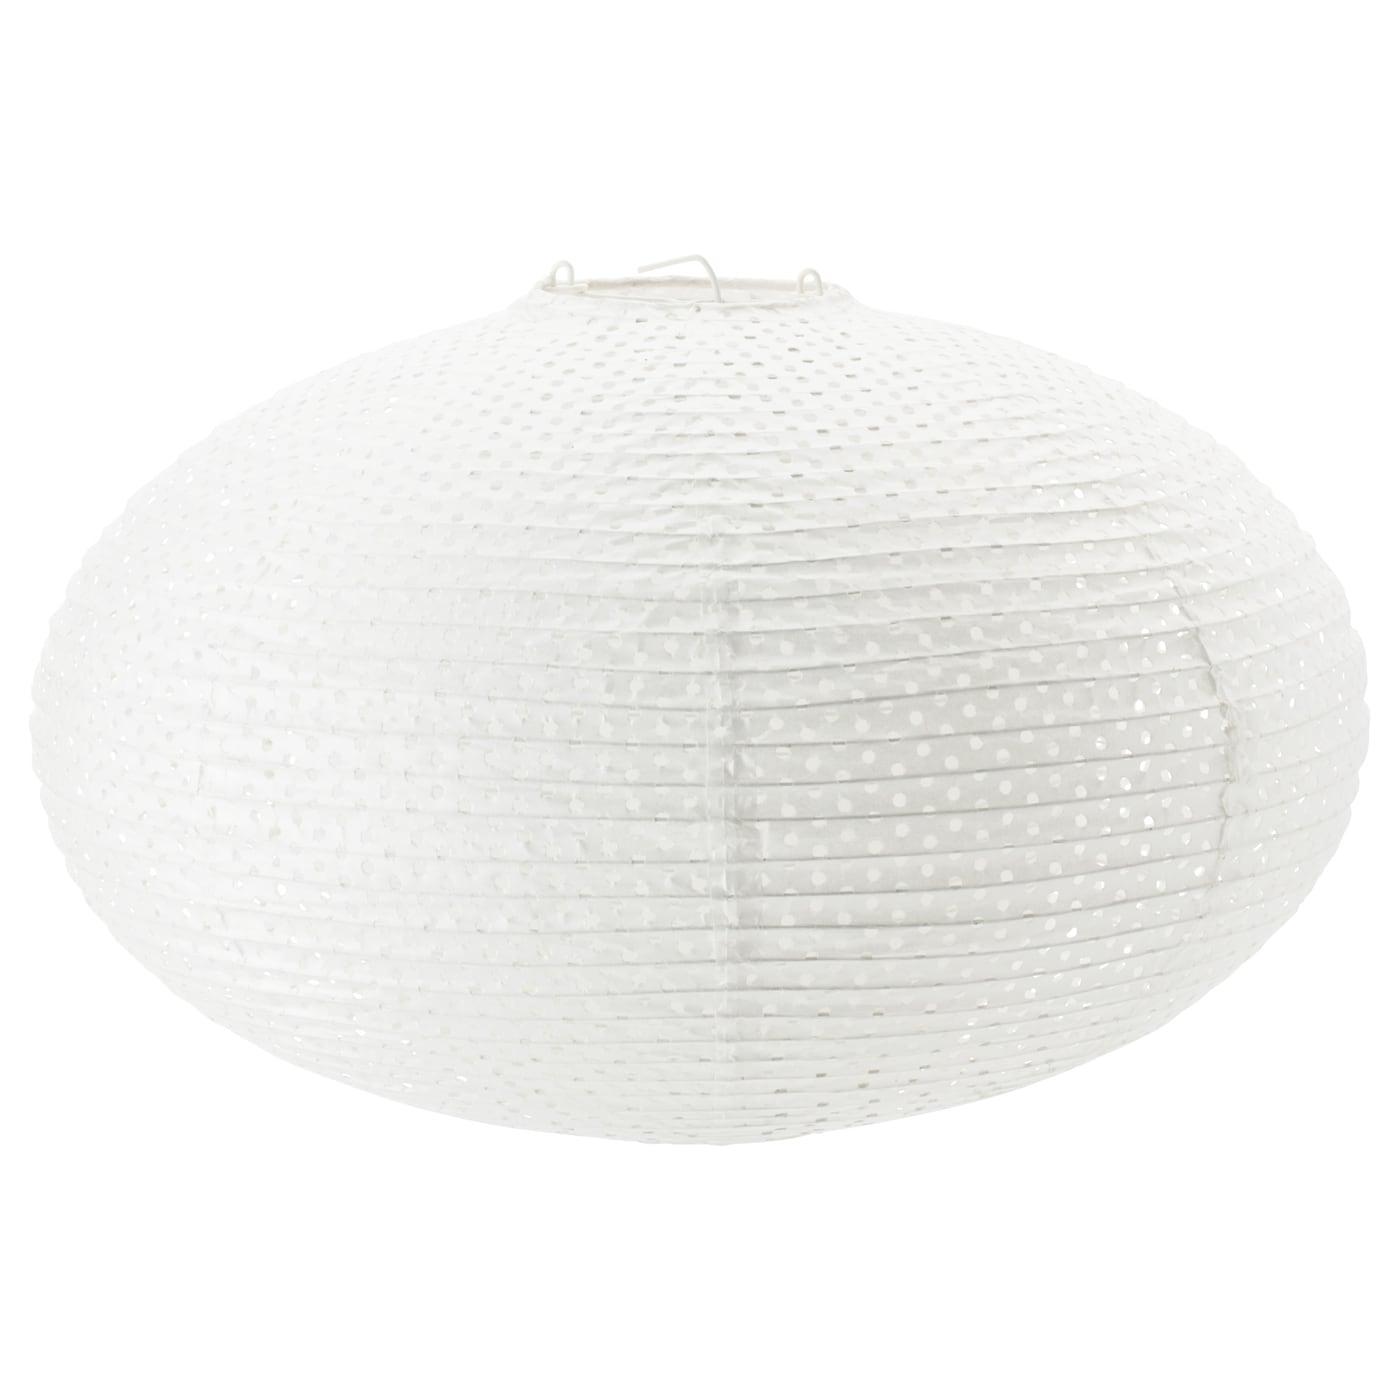 SOLLEFTEÅ Pendant lamp shade Round white - IKEA